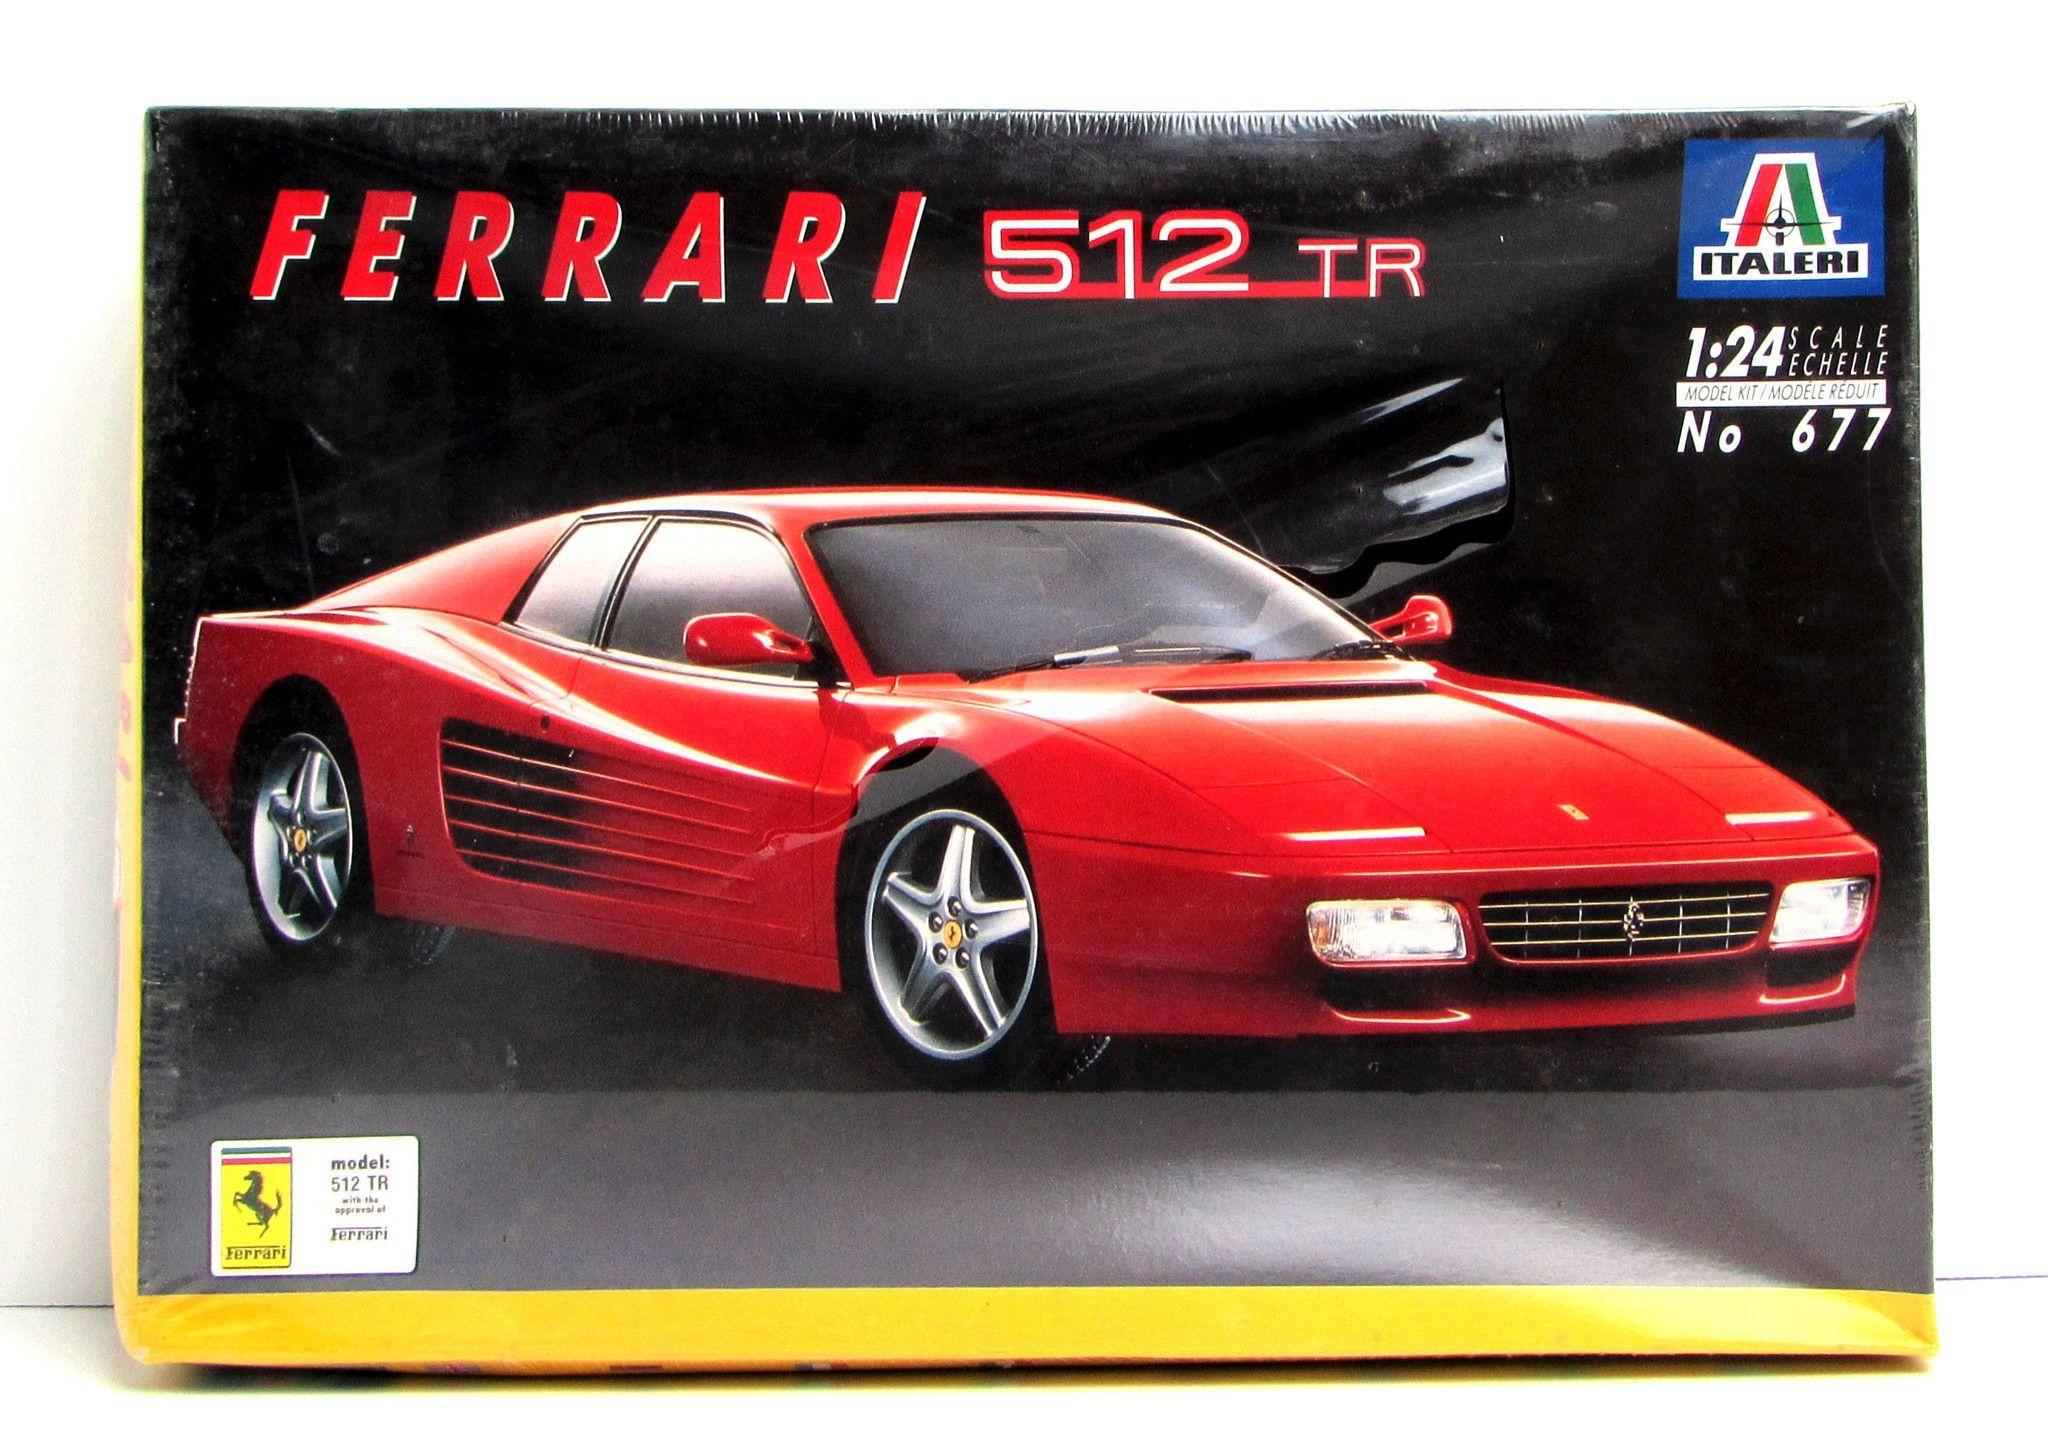 Ferrari 512 Tr Italeri Model Kit 677 1 24 Scale Sports Car